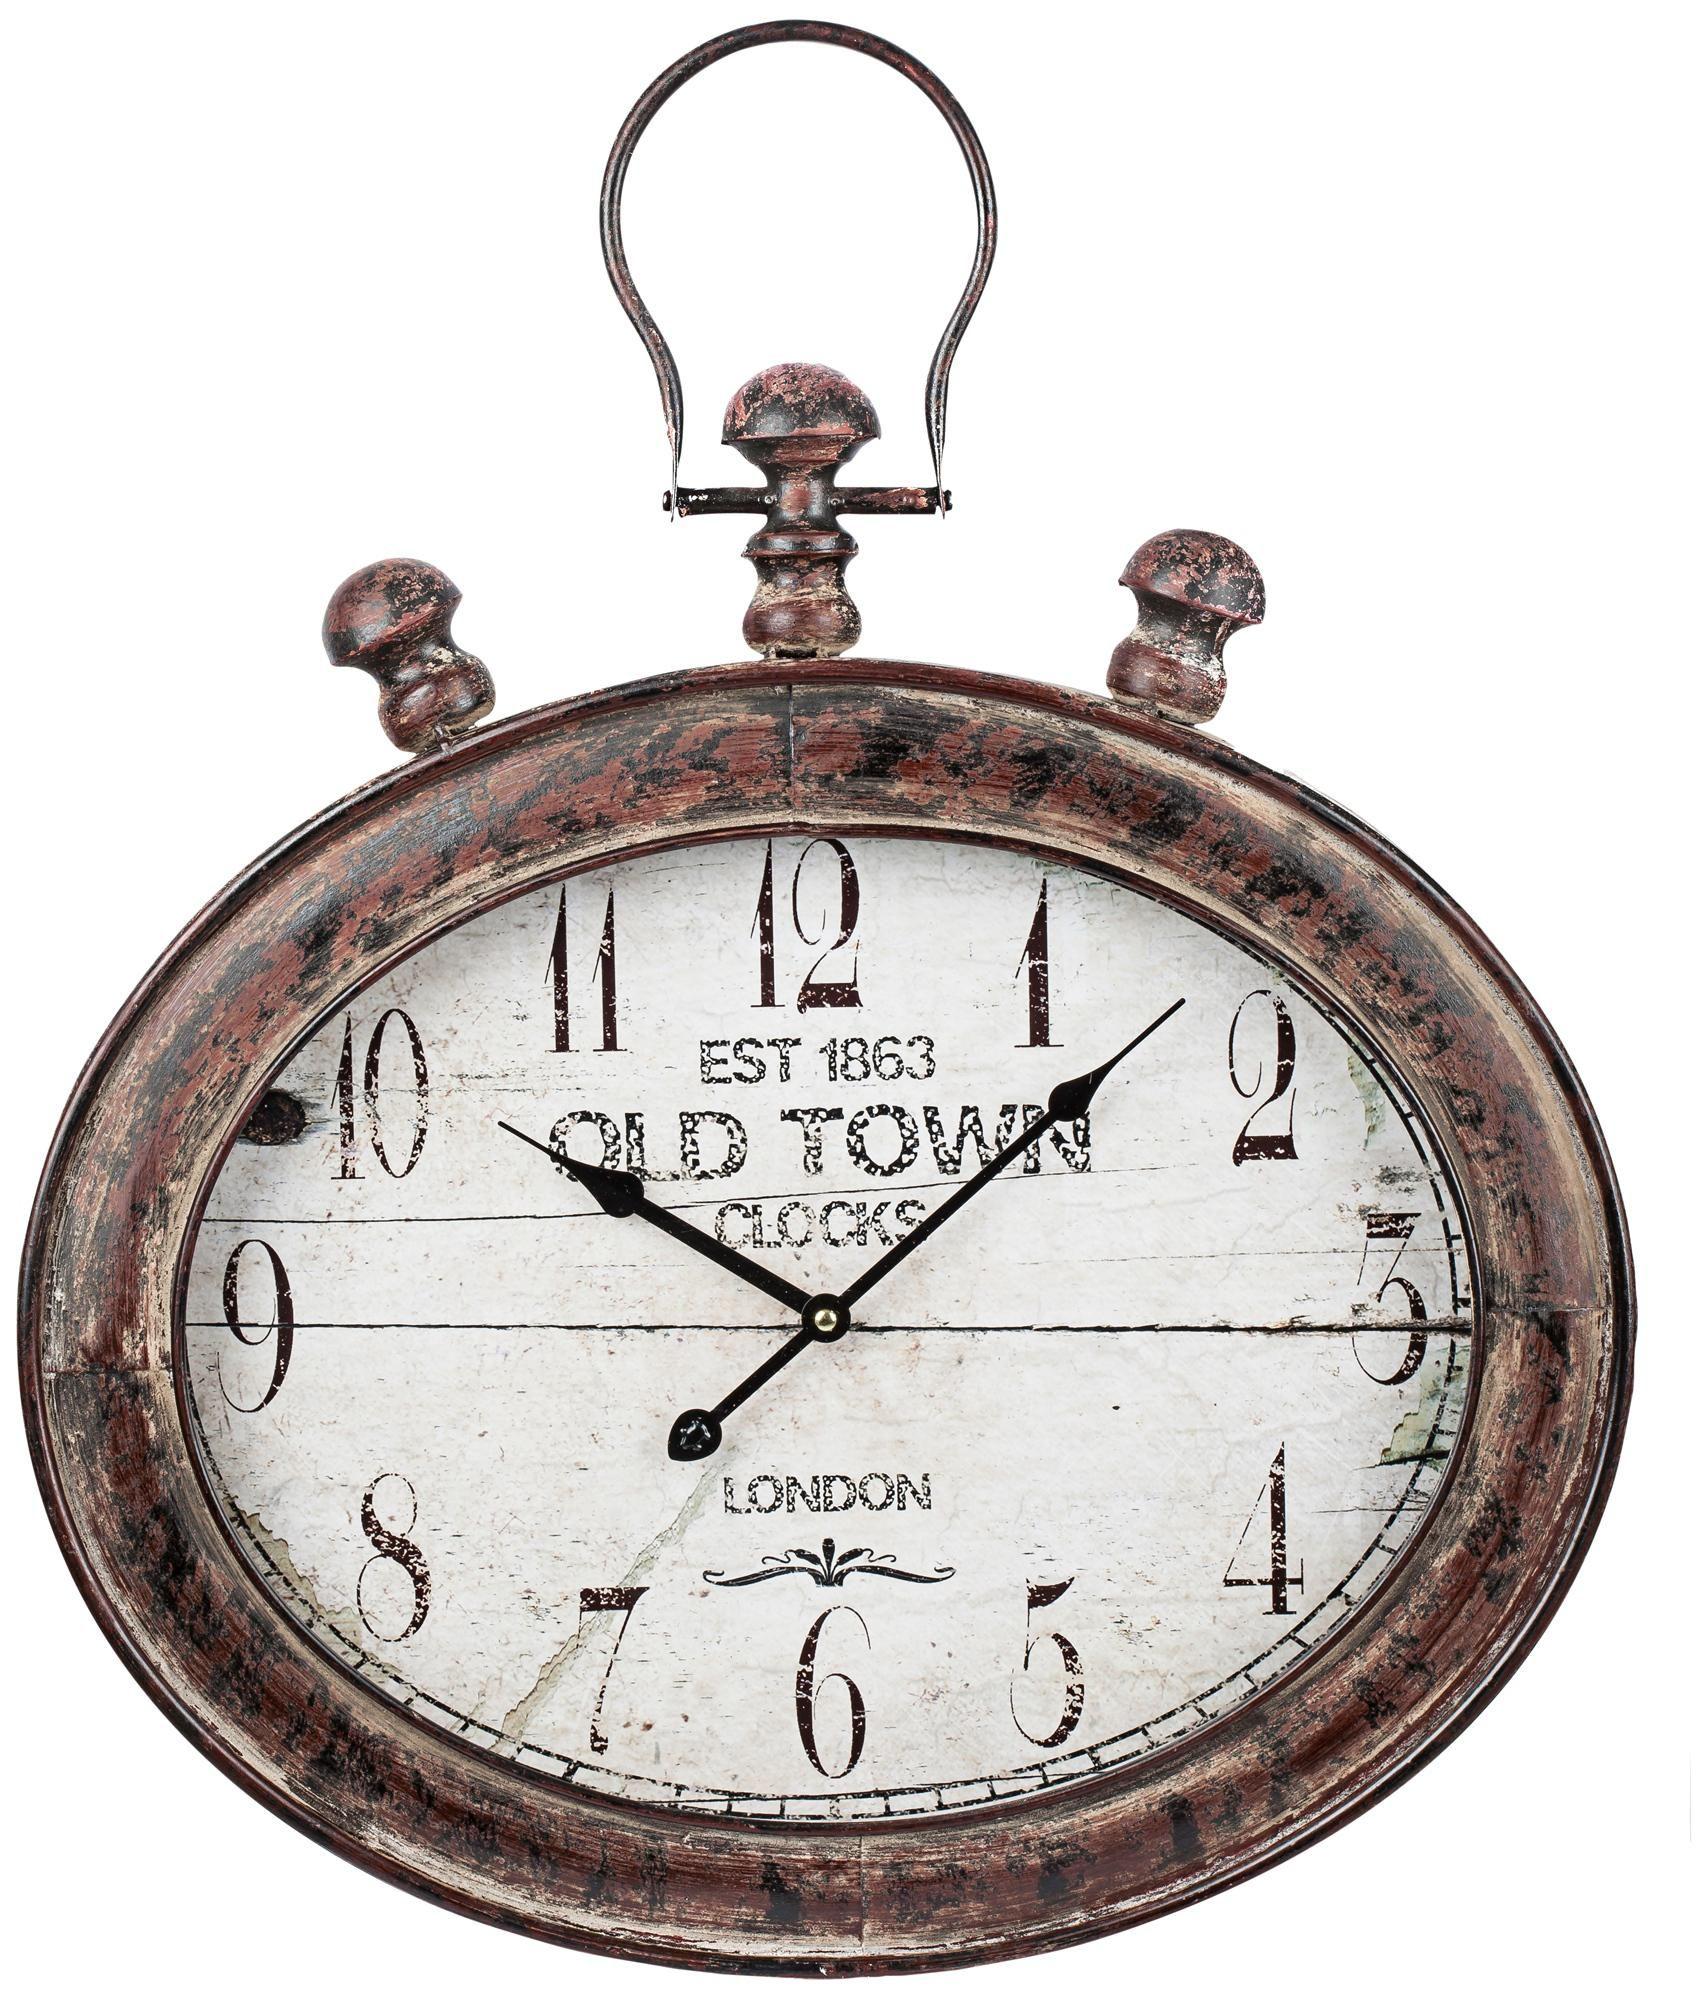 Cooper Classics Amanda 25 3 4 High Brown Black Wall Clock Y3424 Lamps Plus Black Wall Clock Metal Wall Clock Large Oval Wall Clock